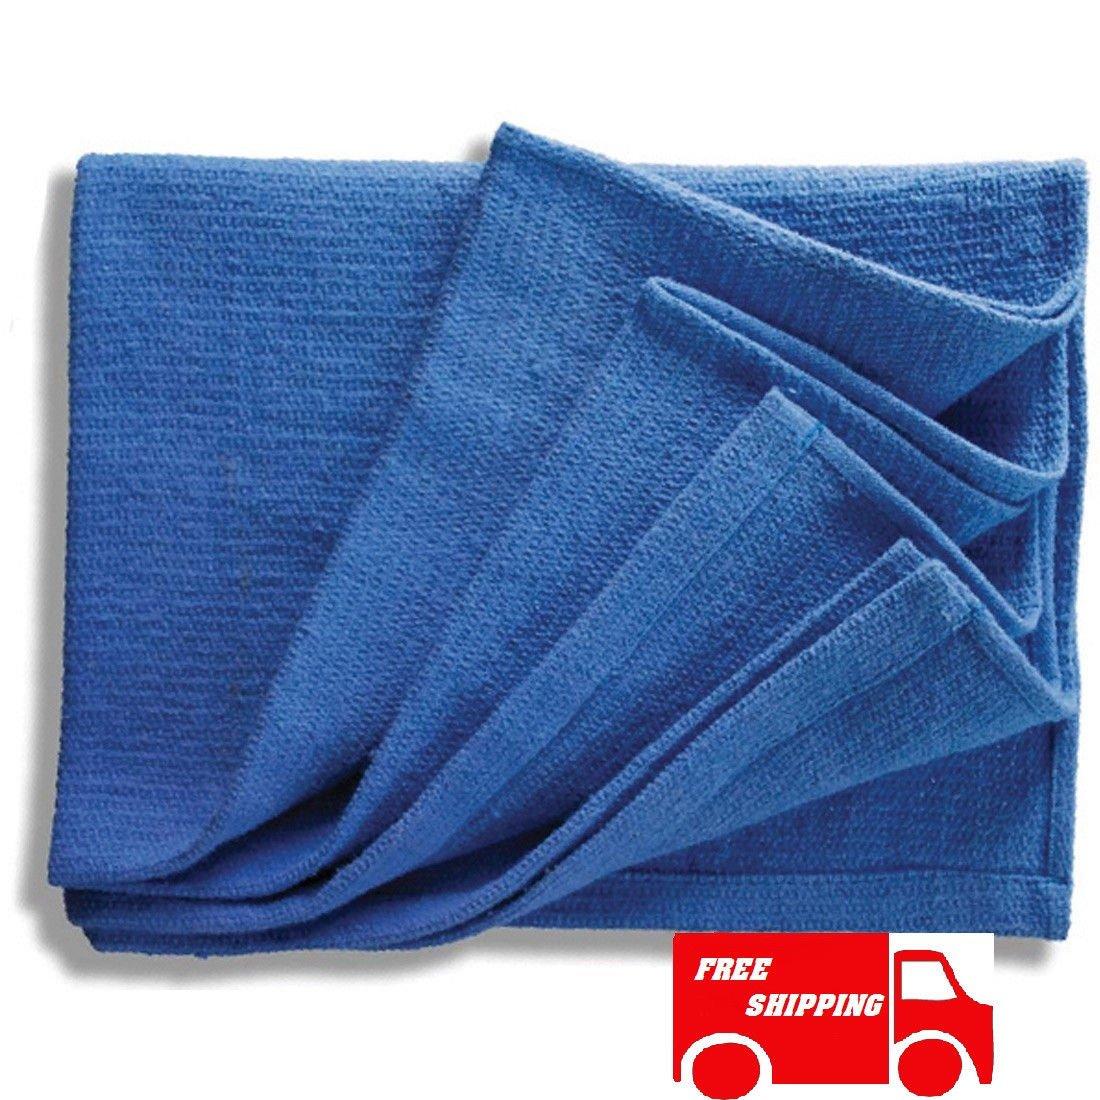 GHP 75Pcs Lint Free Heavy Weight Fabric Blue Huck Towel/Rags Towel